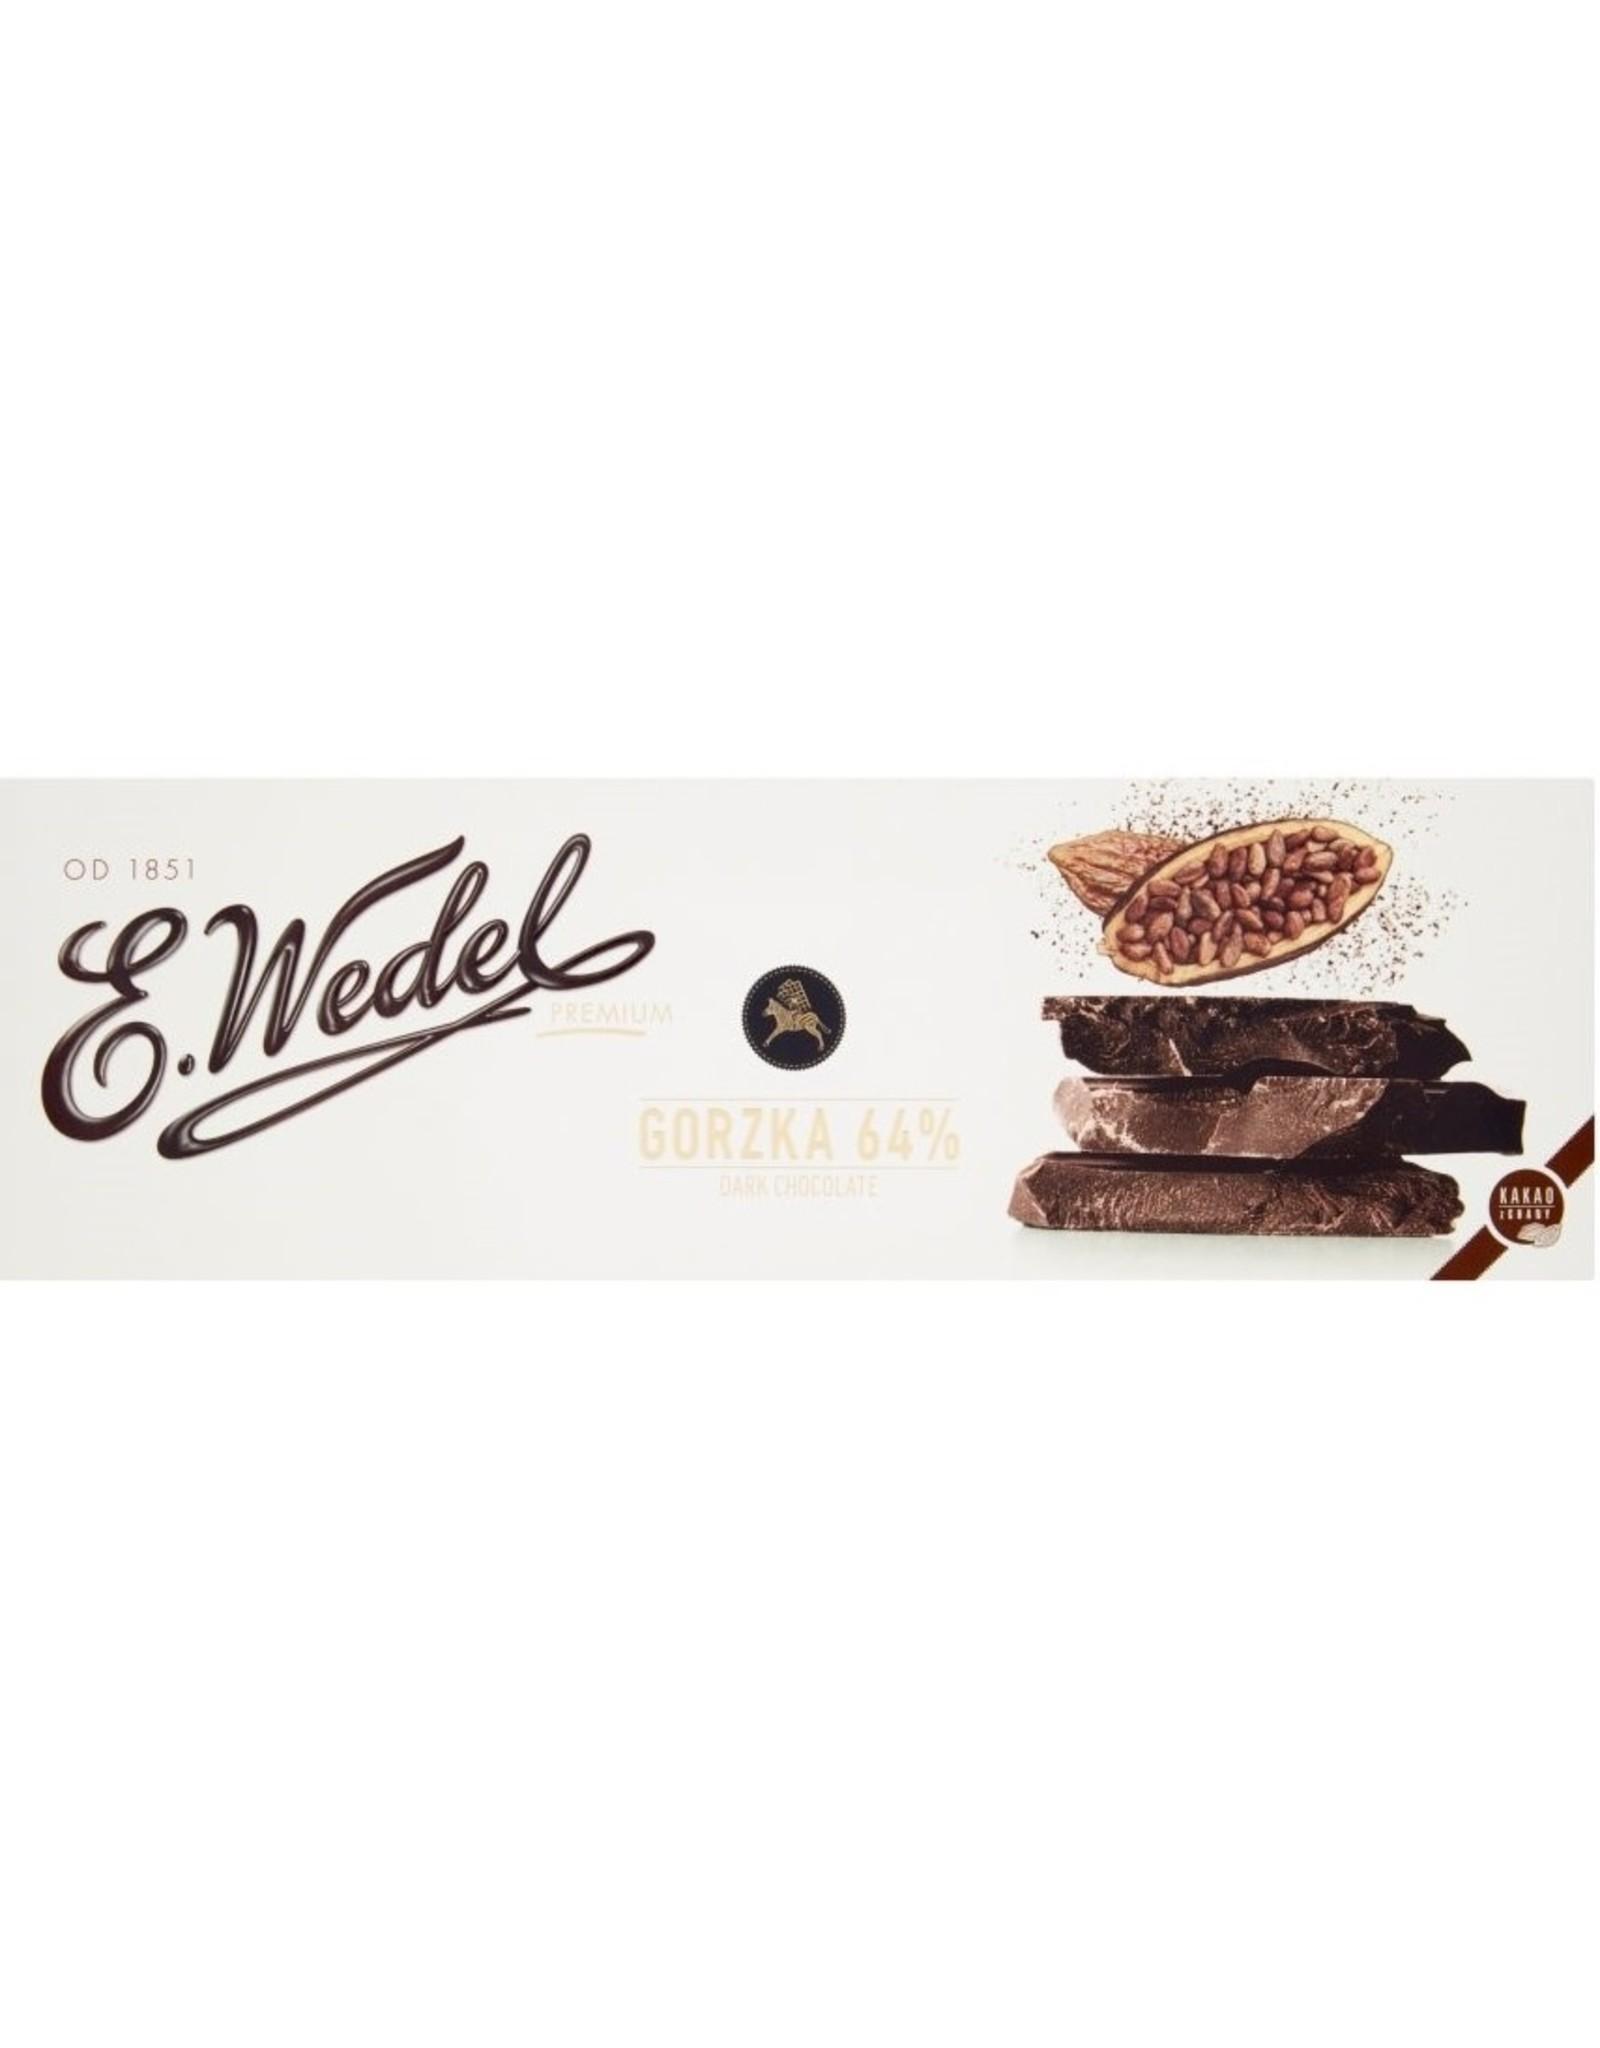 Wedel 64% Dark Chocolate Bar Double